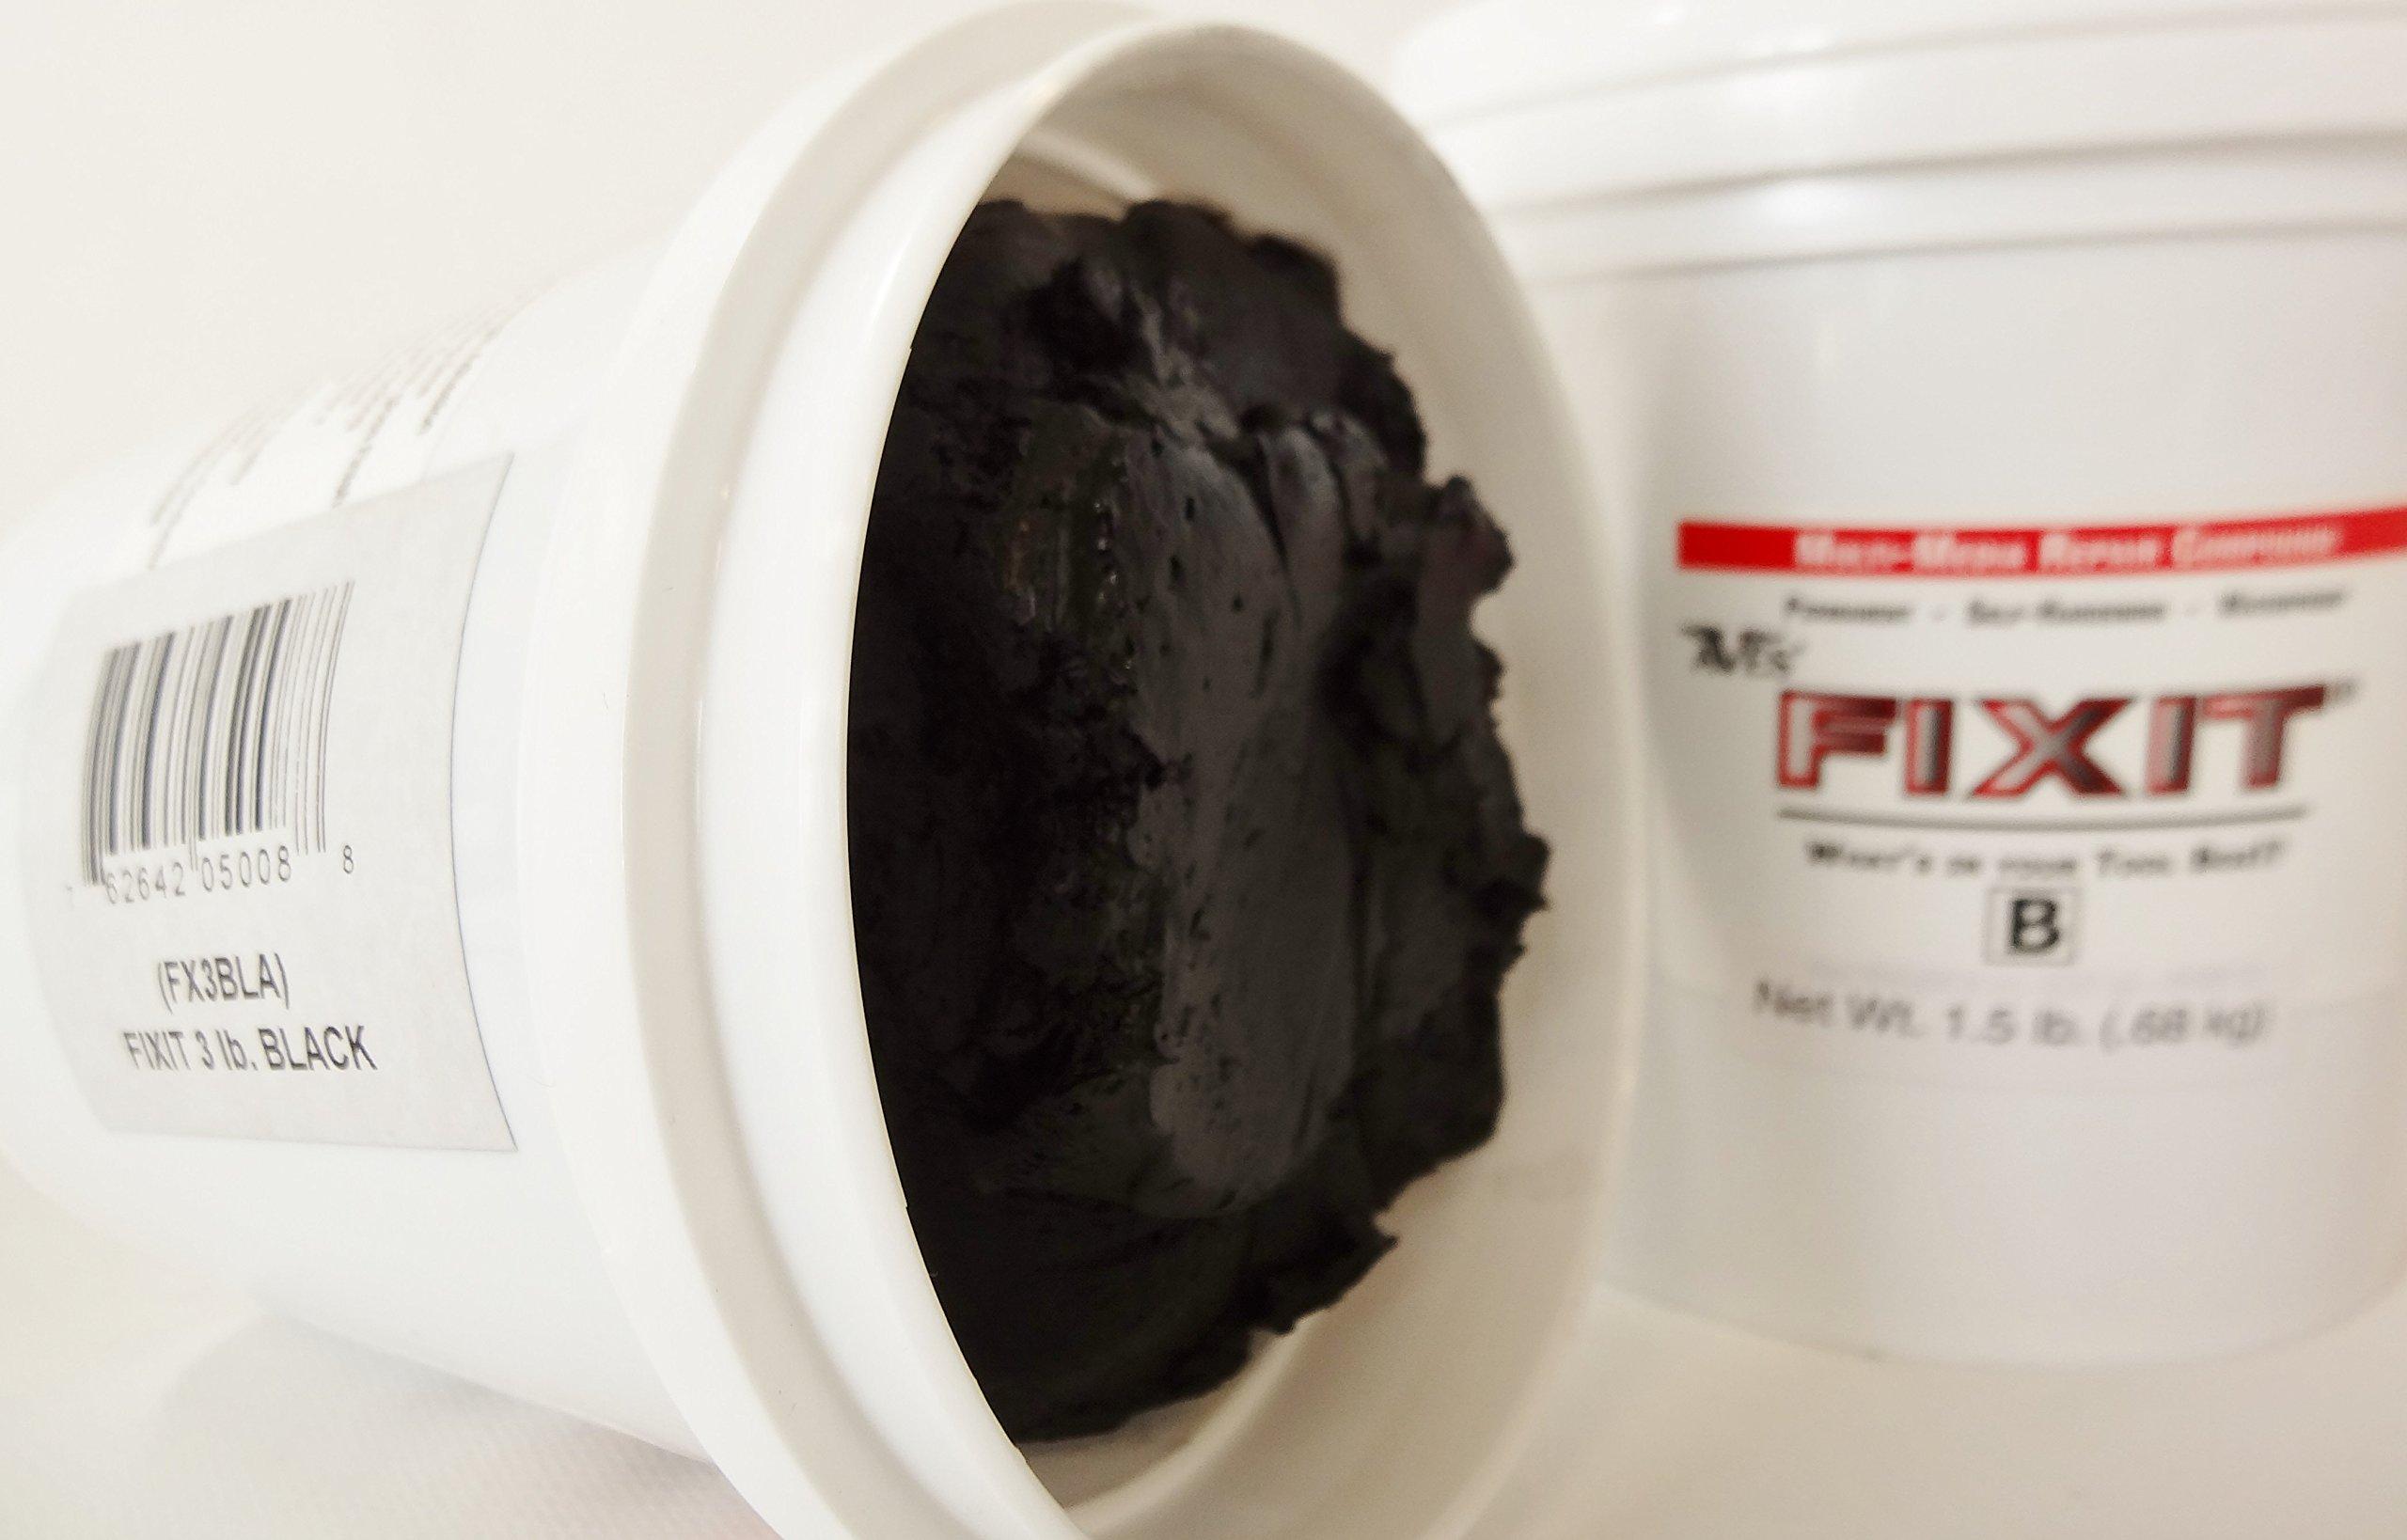 Fixit 3 Lb. Epoxy Clay BLack by Fix It